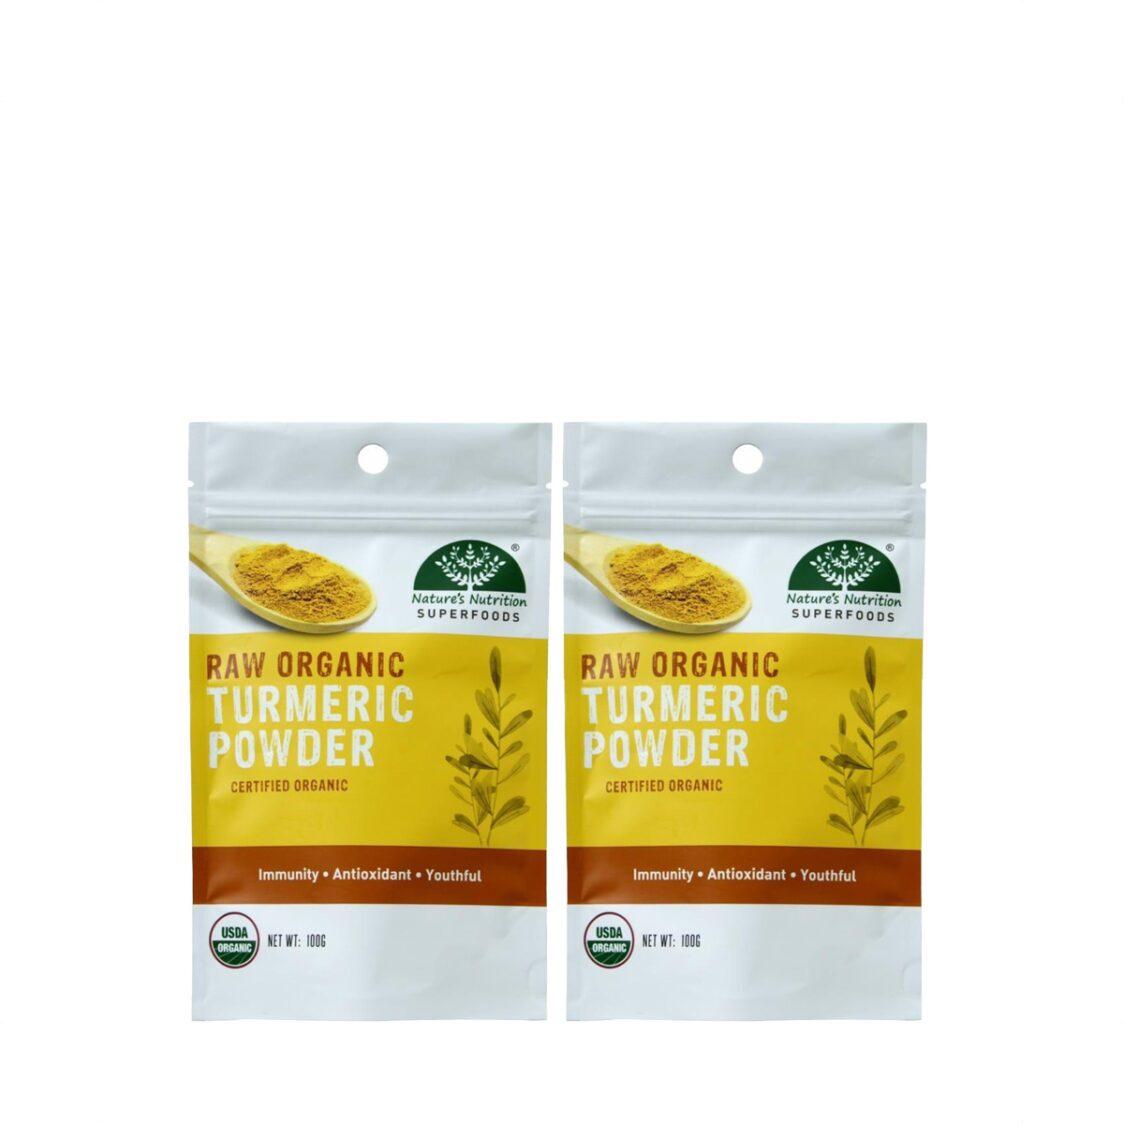 Natures Nutrition Organic Turmeric Powder 100g Bundle of 2